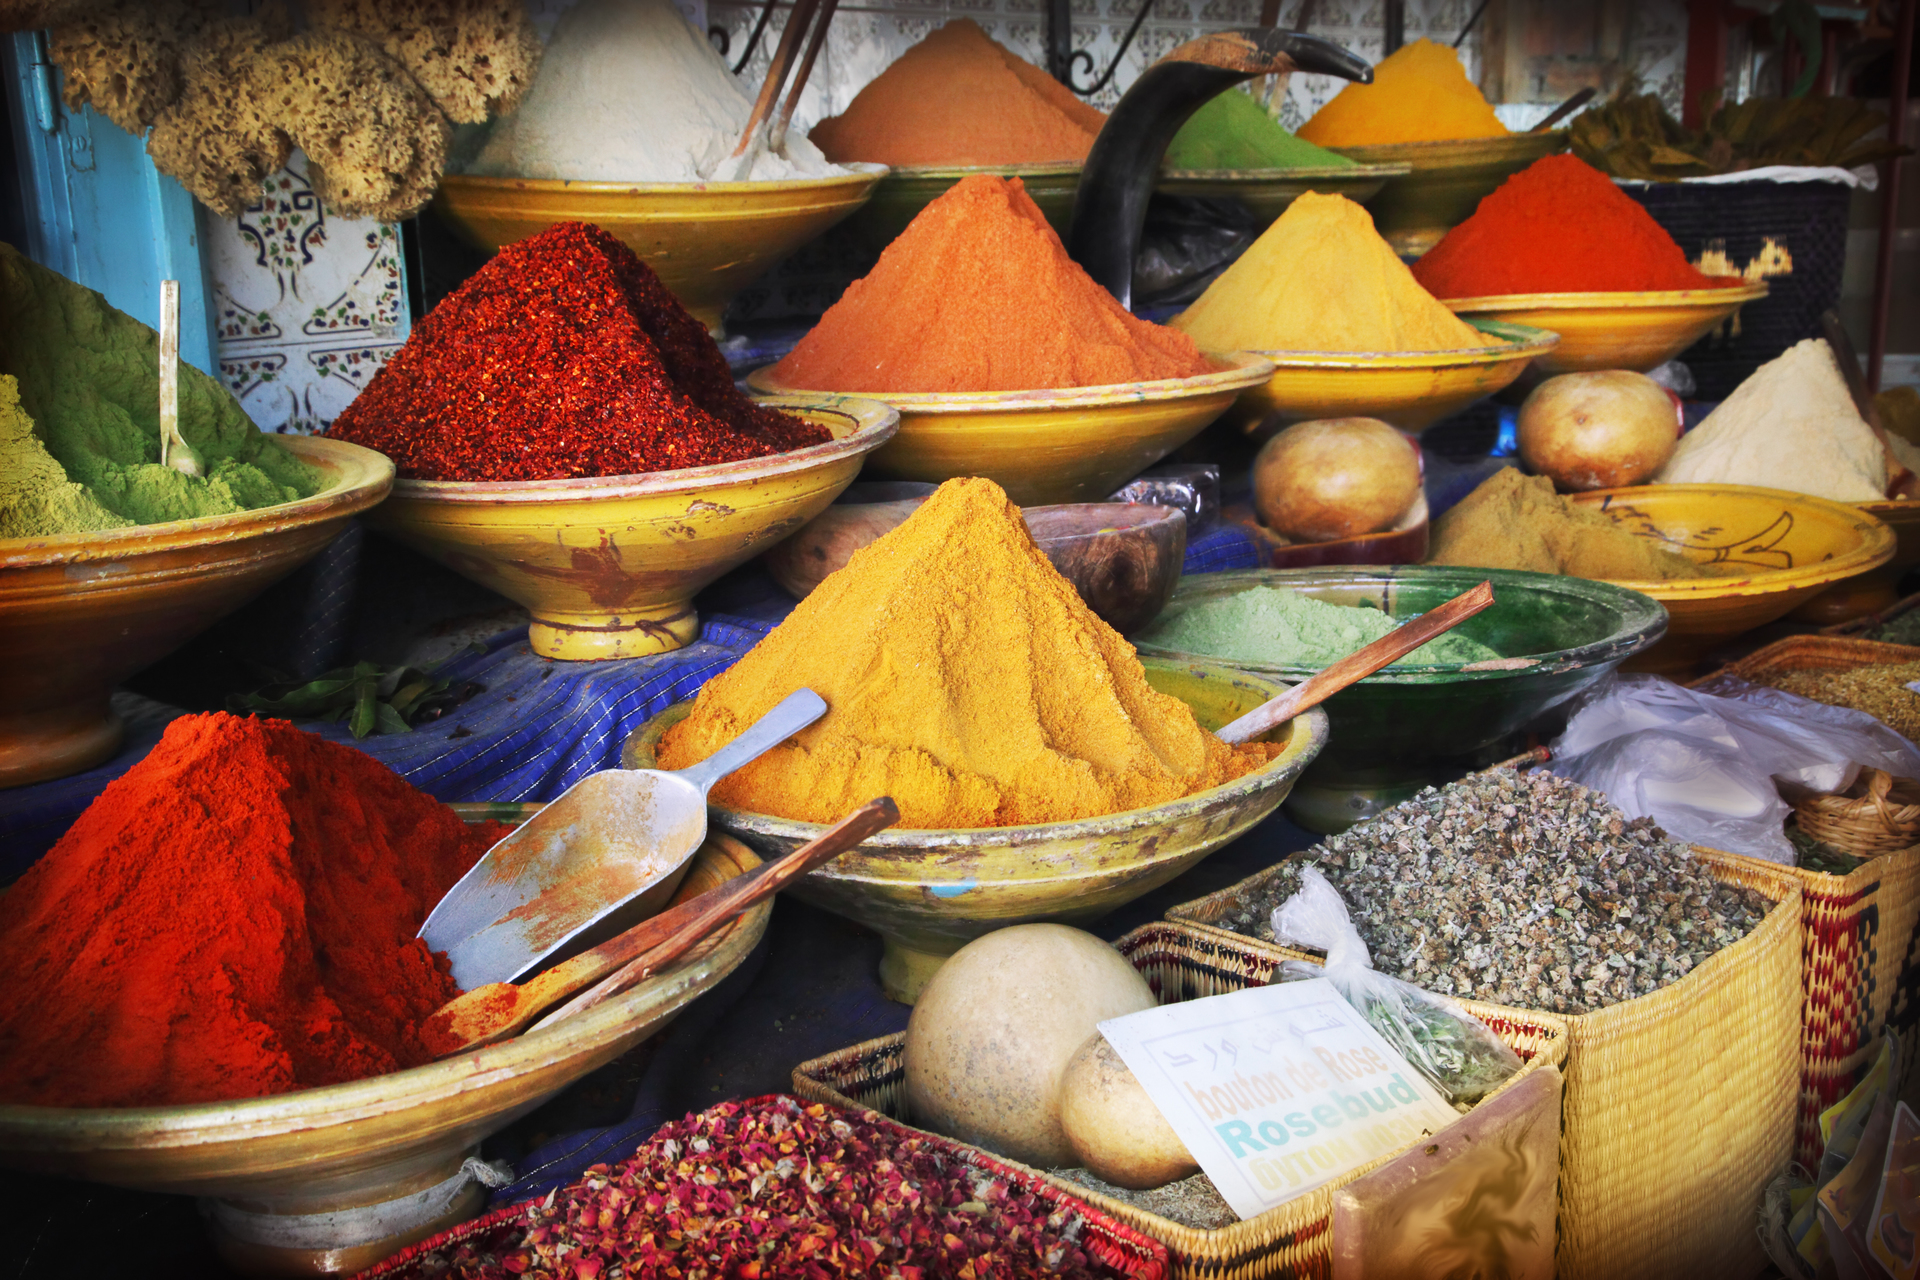 Marokko kleurrijke kruiden op markt - couleur locale &Olives